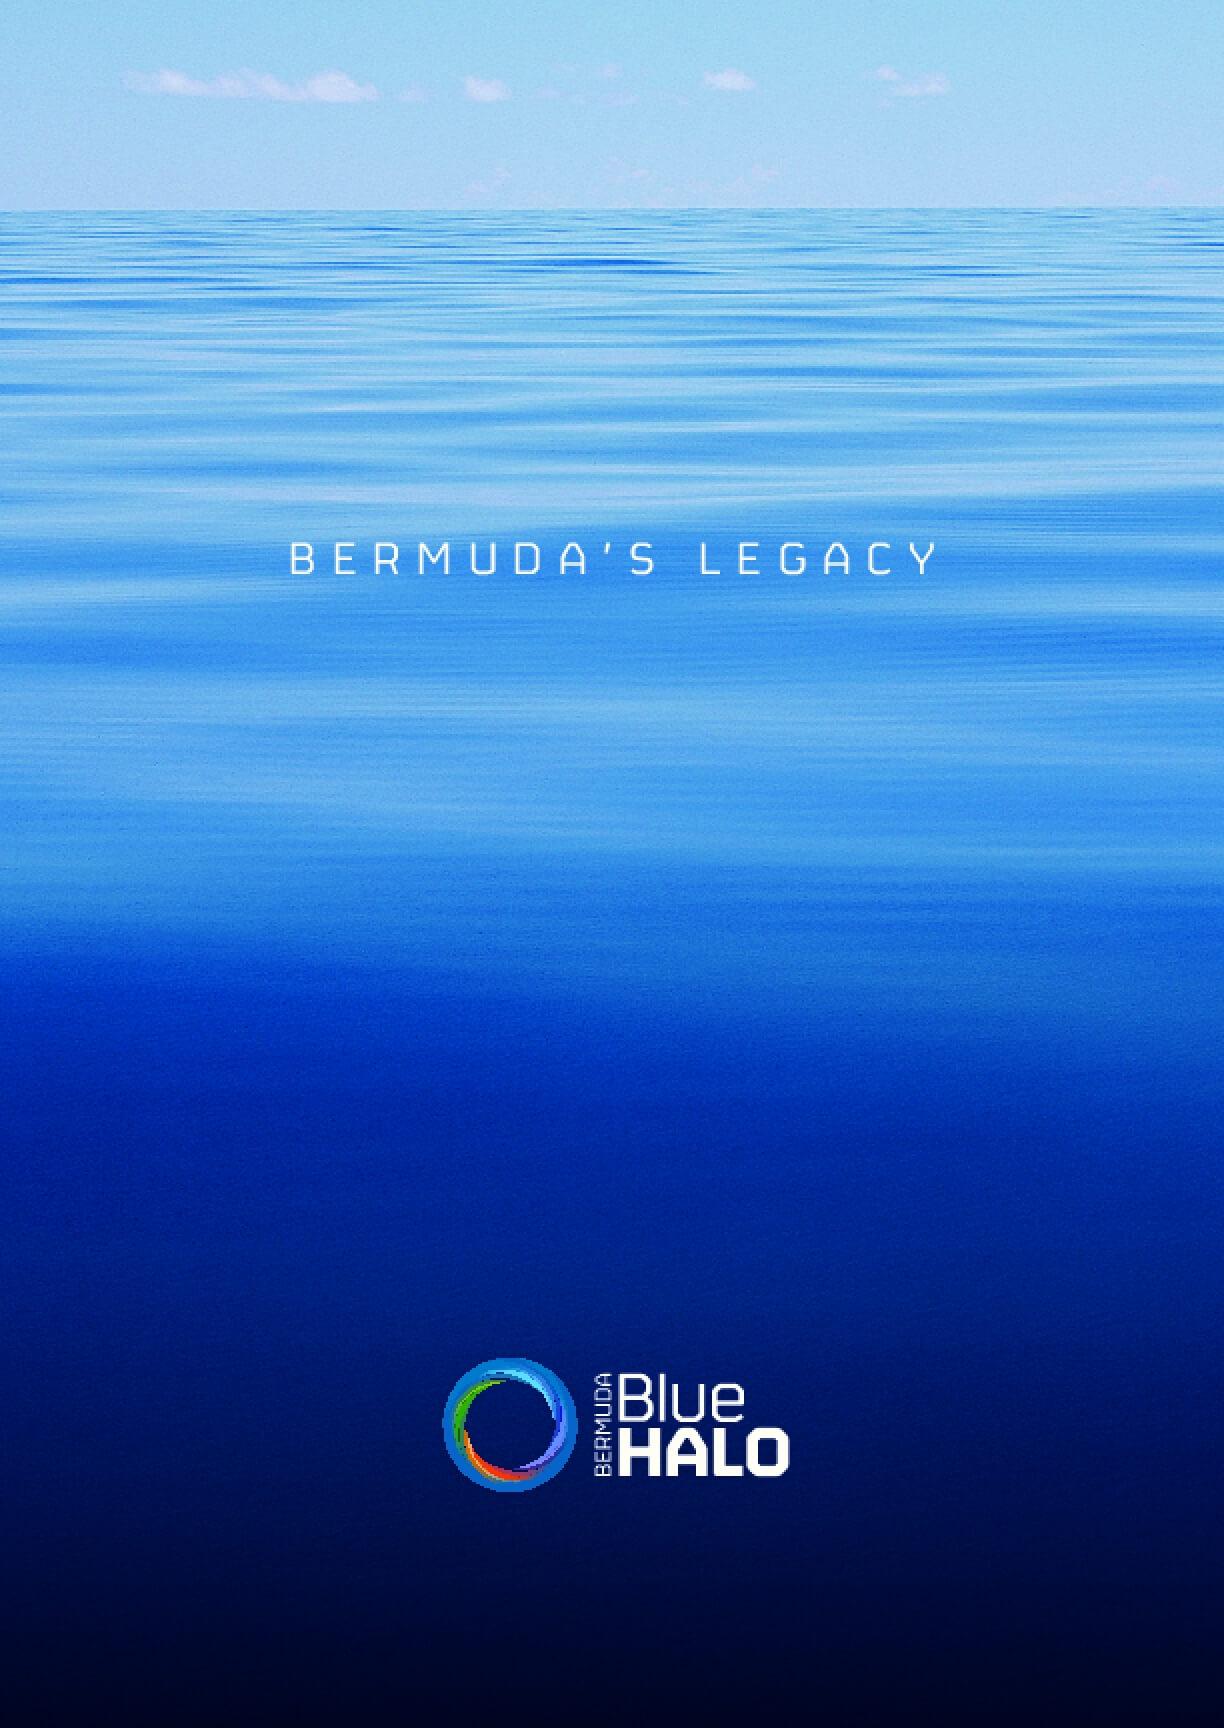 Bermuda's Legacy